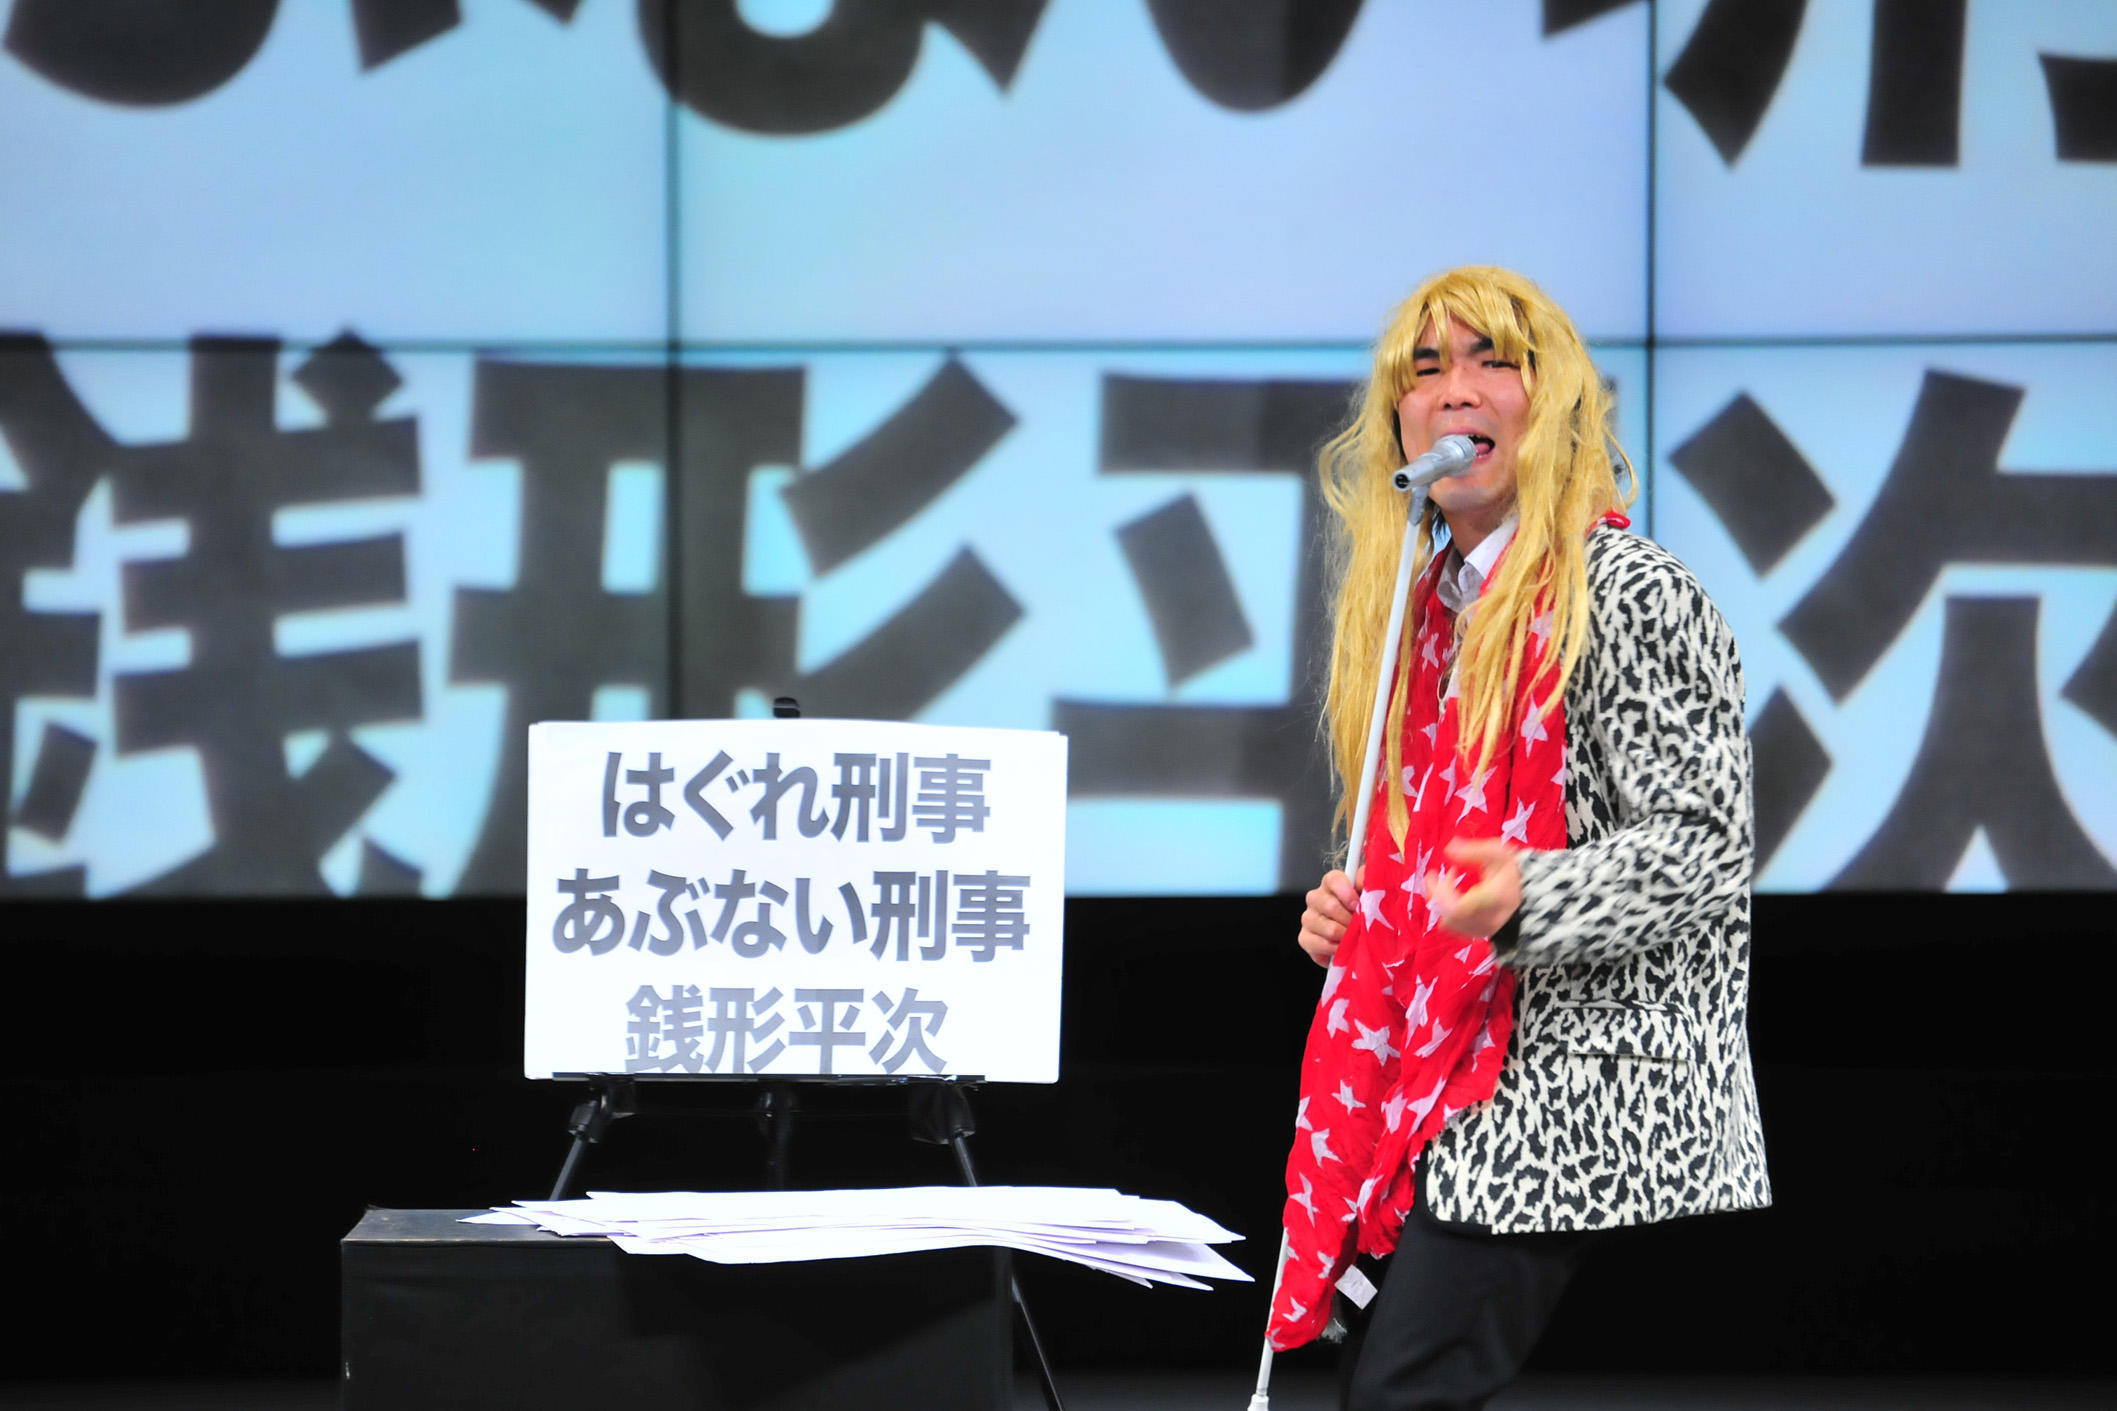 http://news.yoshimoto.co.jp/20160429204015-fca37bd0477c4300845511b5bbdc9deb77254806.jpg